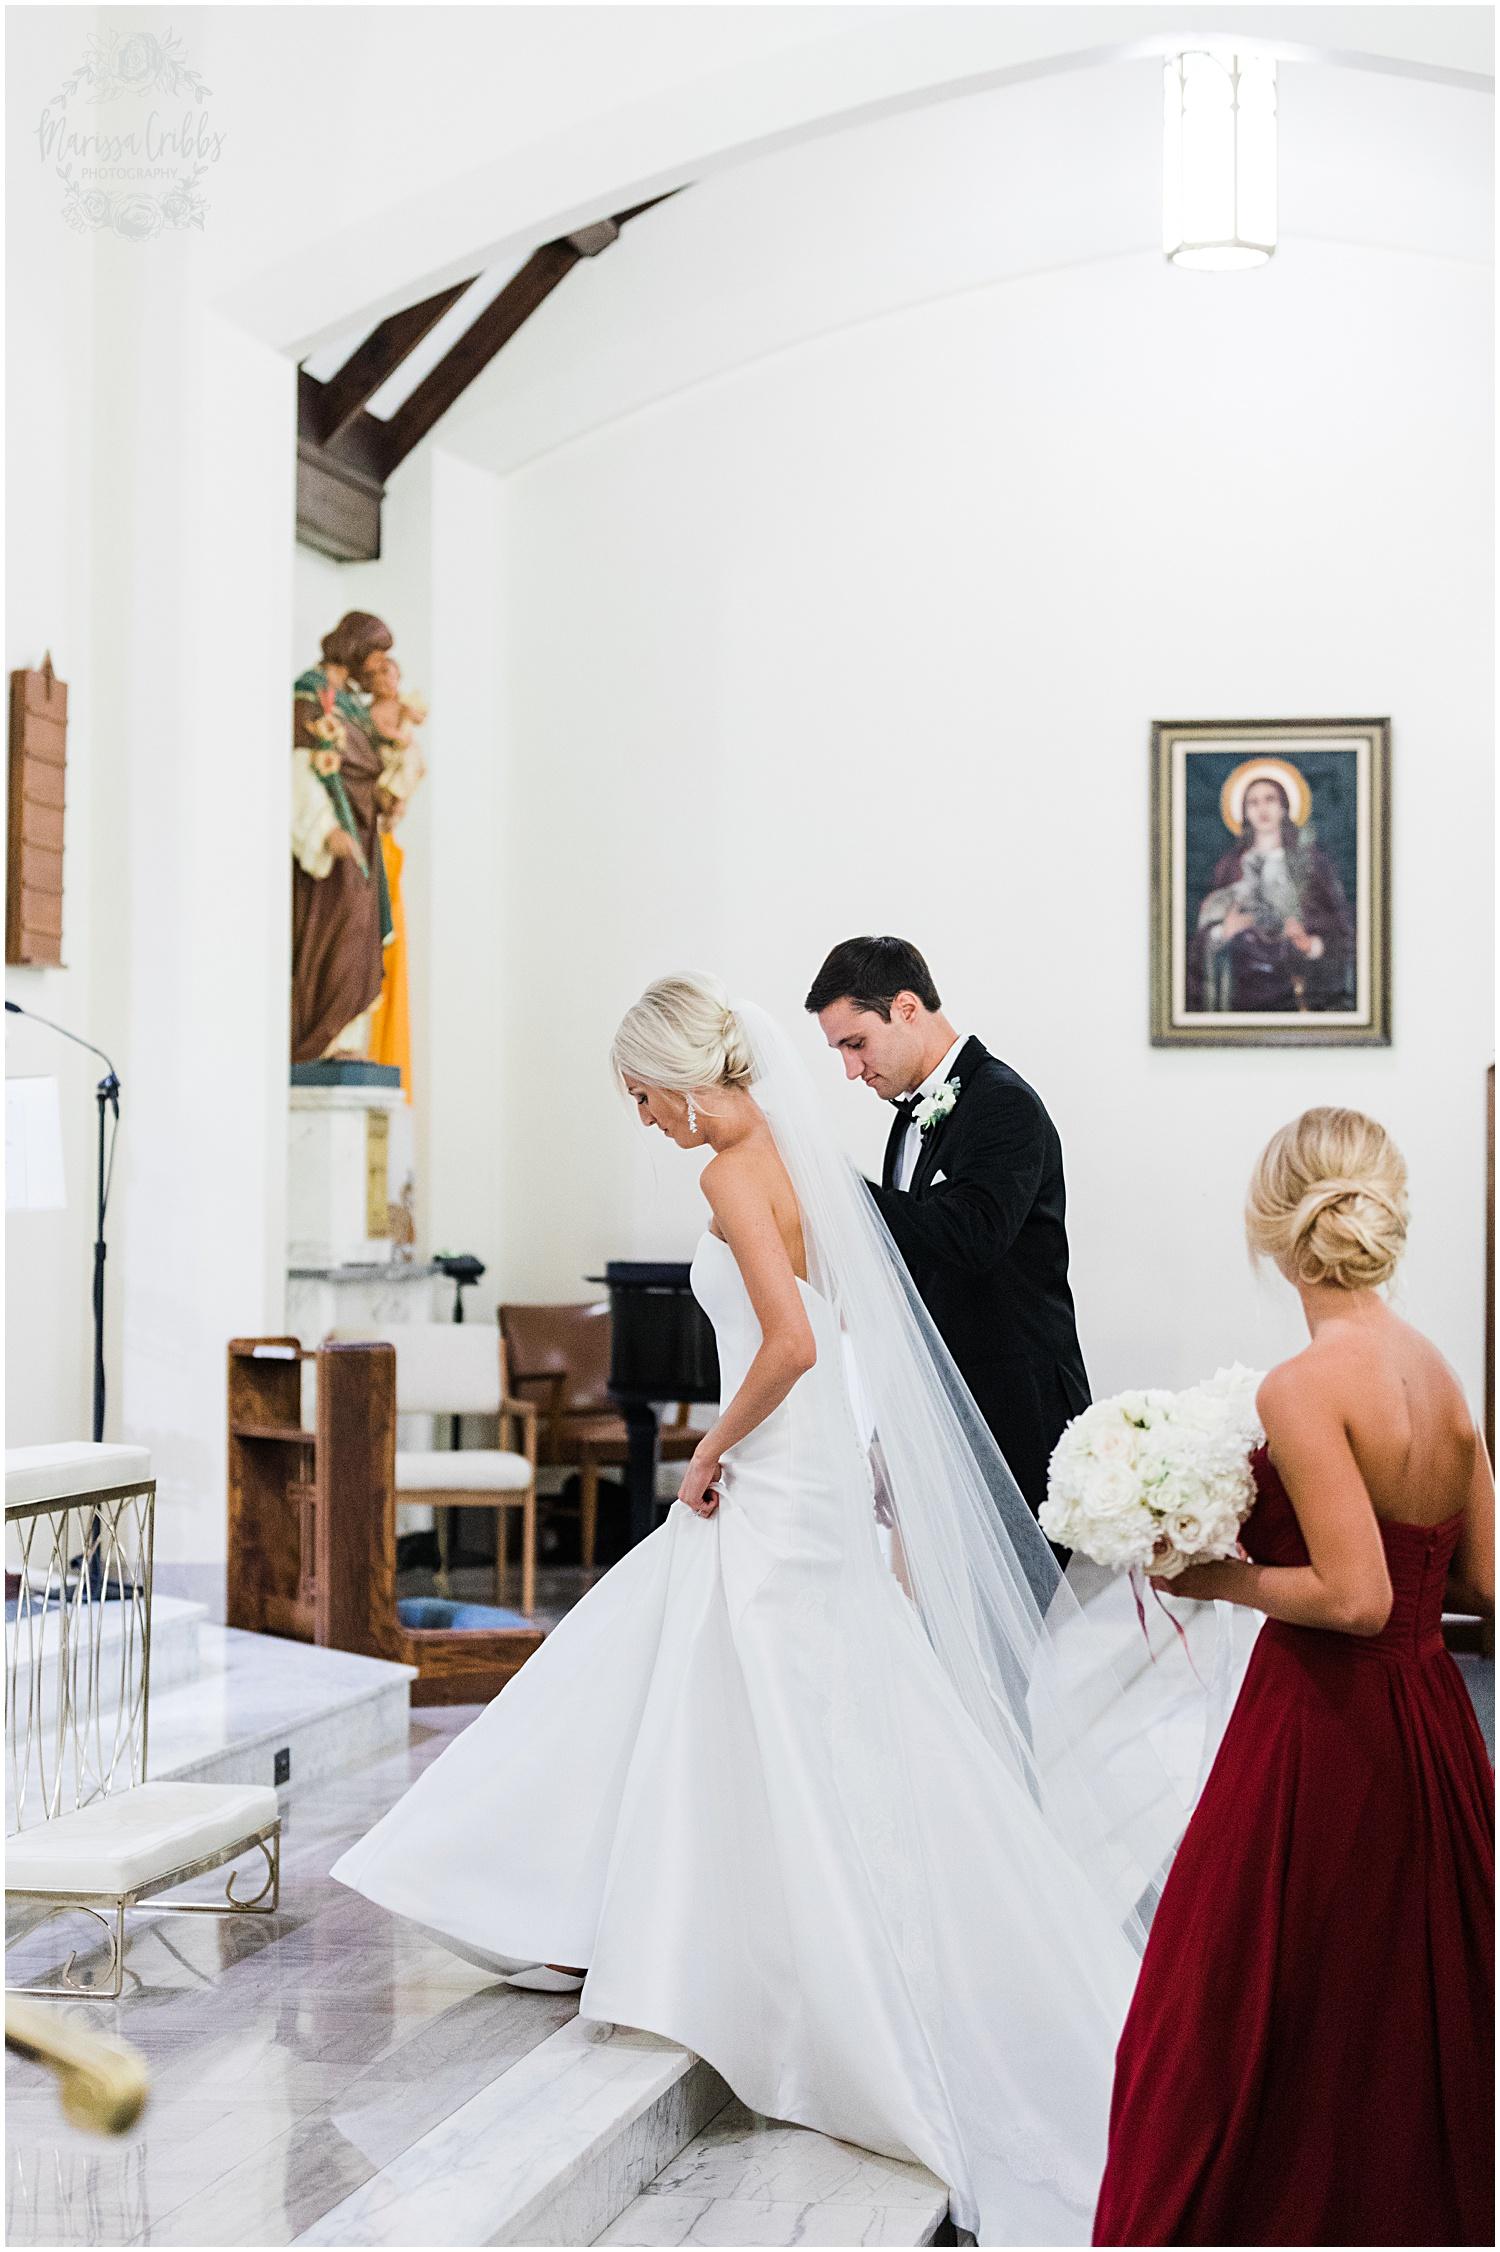 NOLL WEDDING | THE BRASS ON BALTIMORE | MARISSA CRIBBS PHOTOGRAPHY_6288.jpg